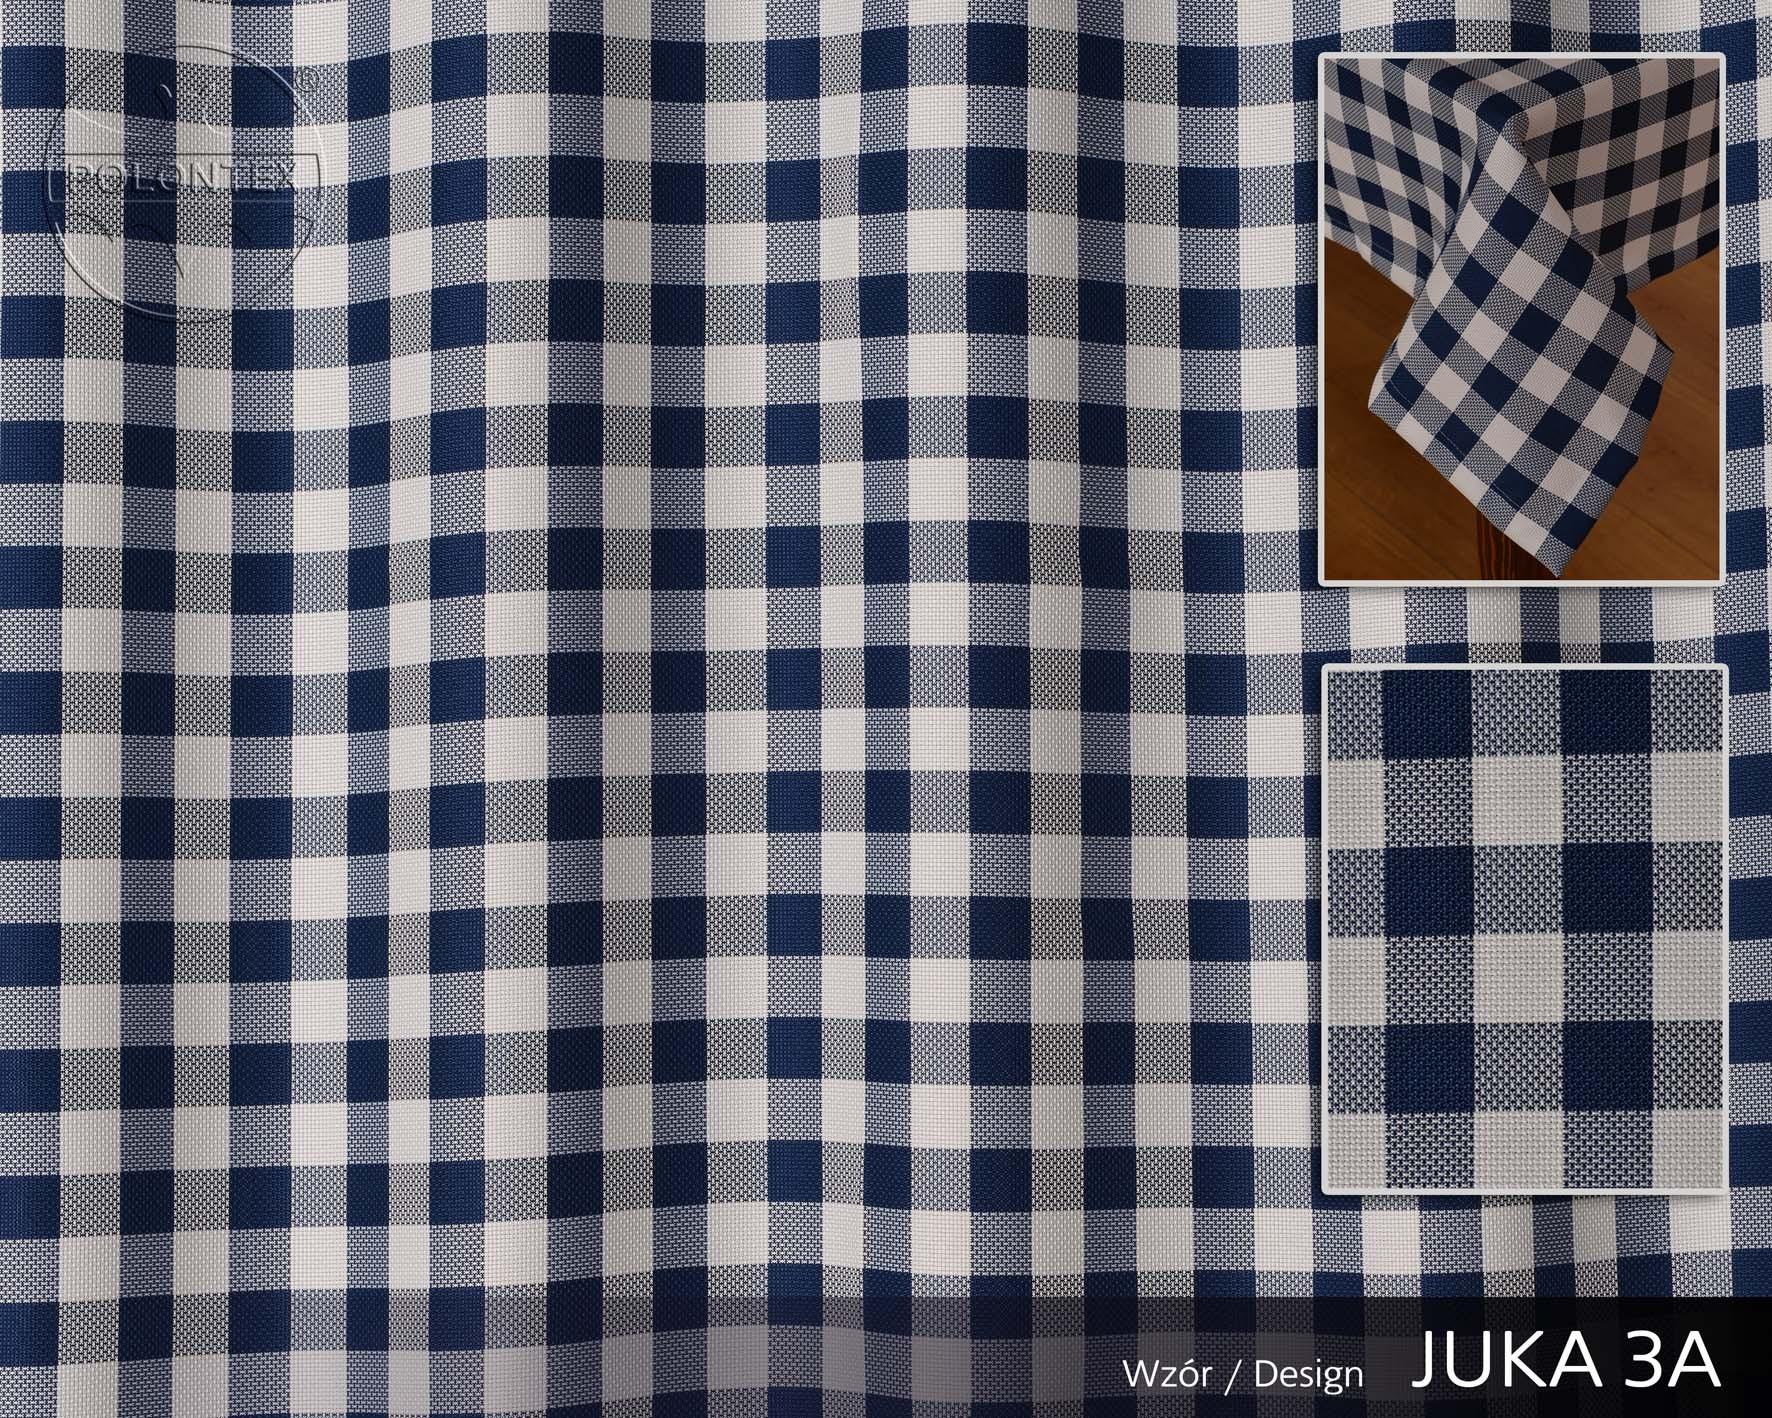 JUKA 5307